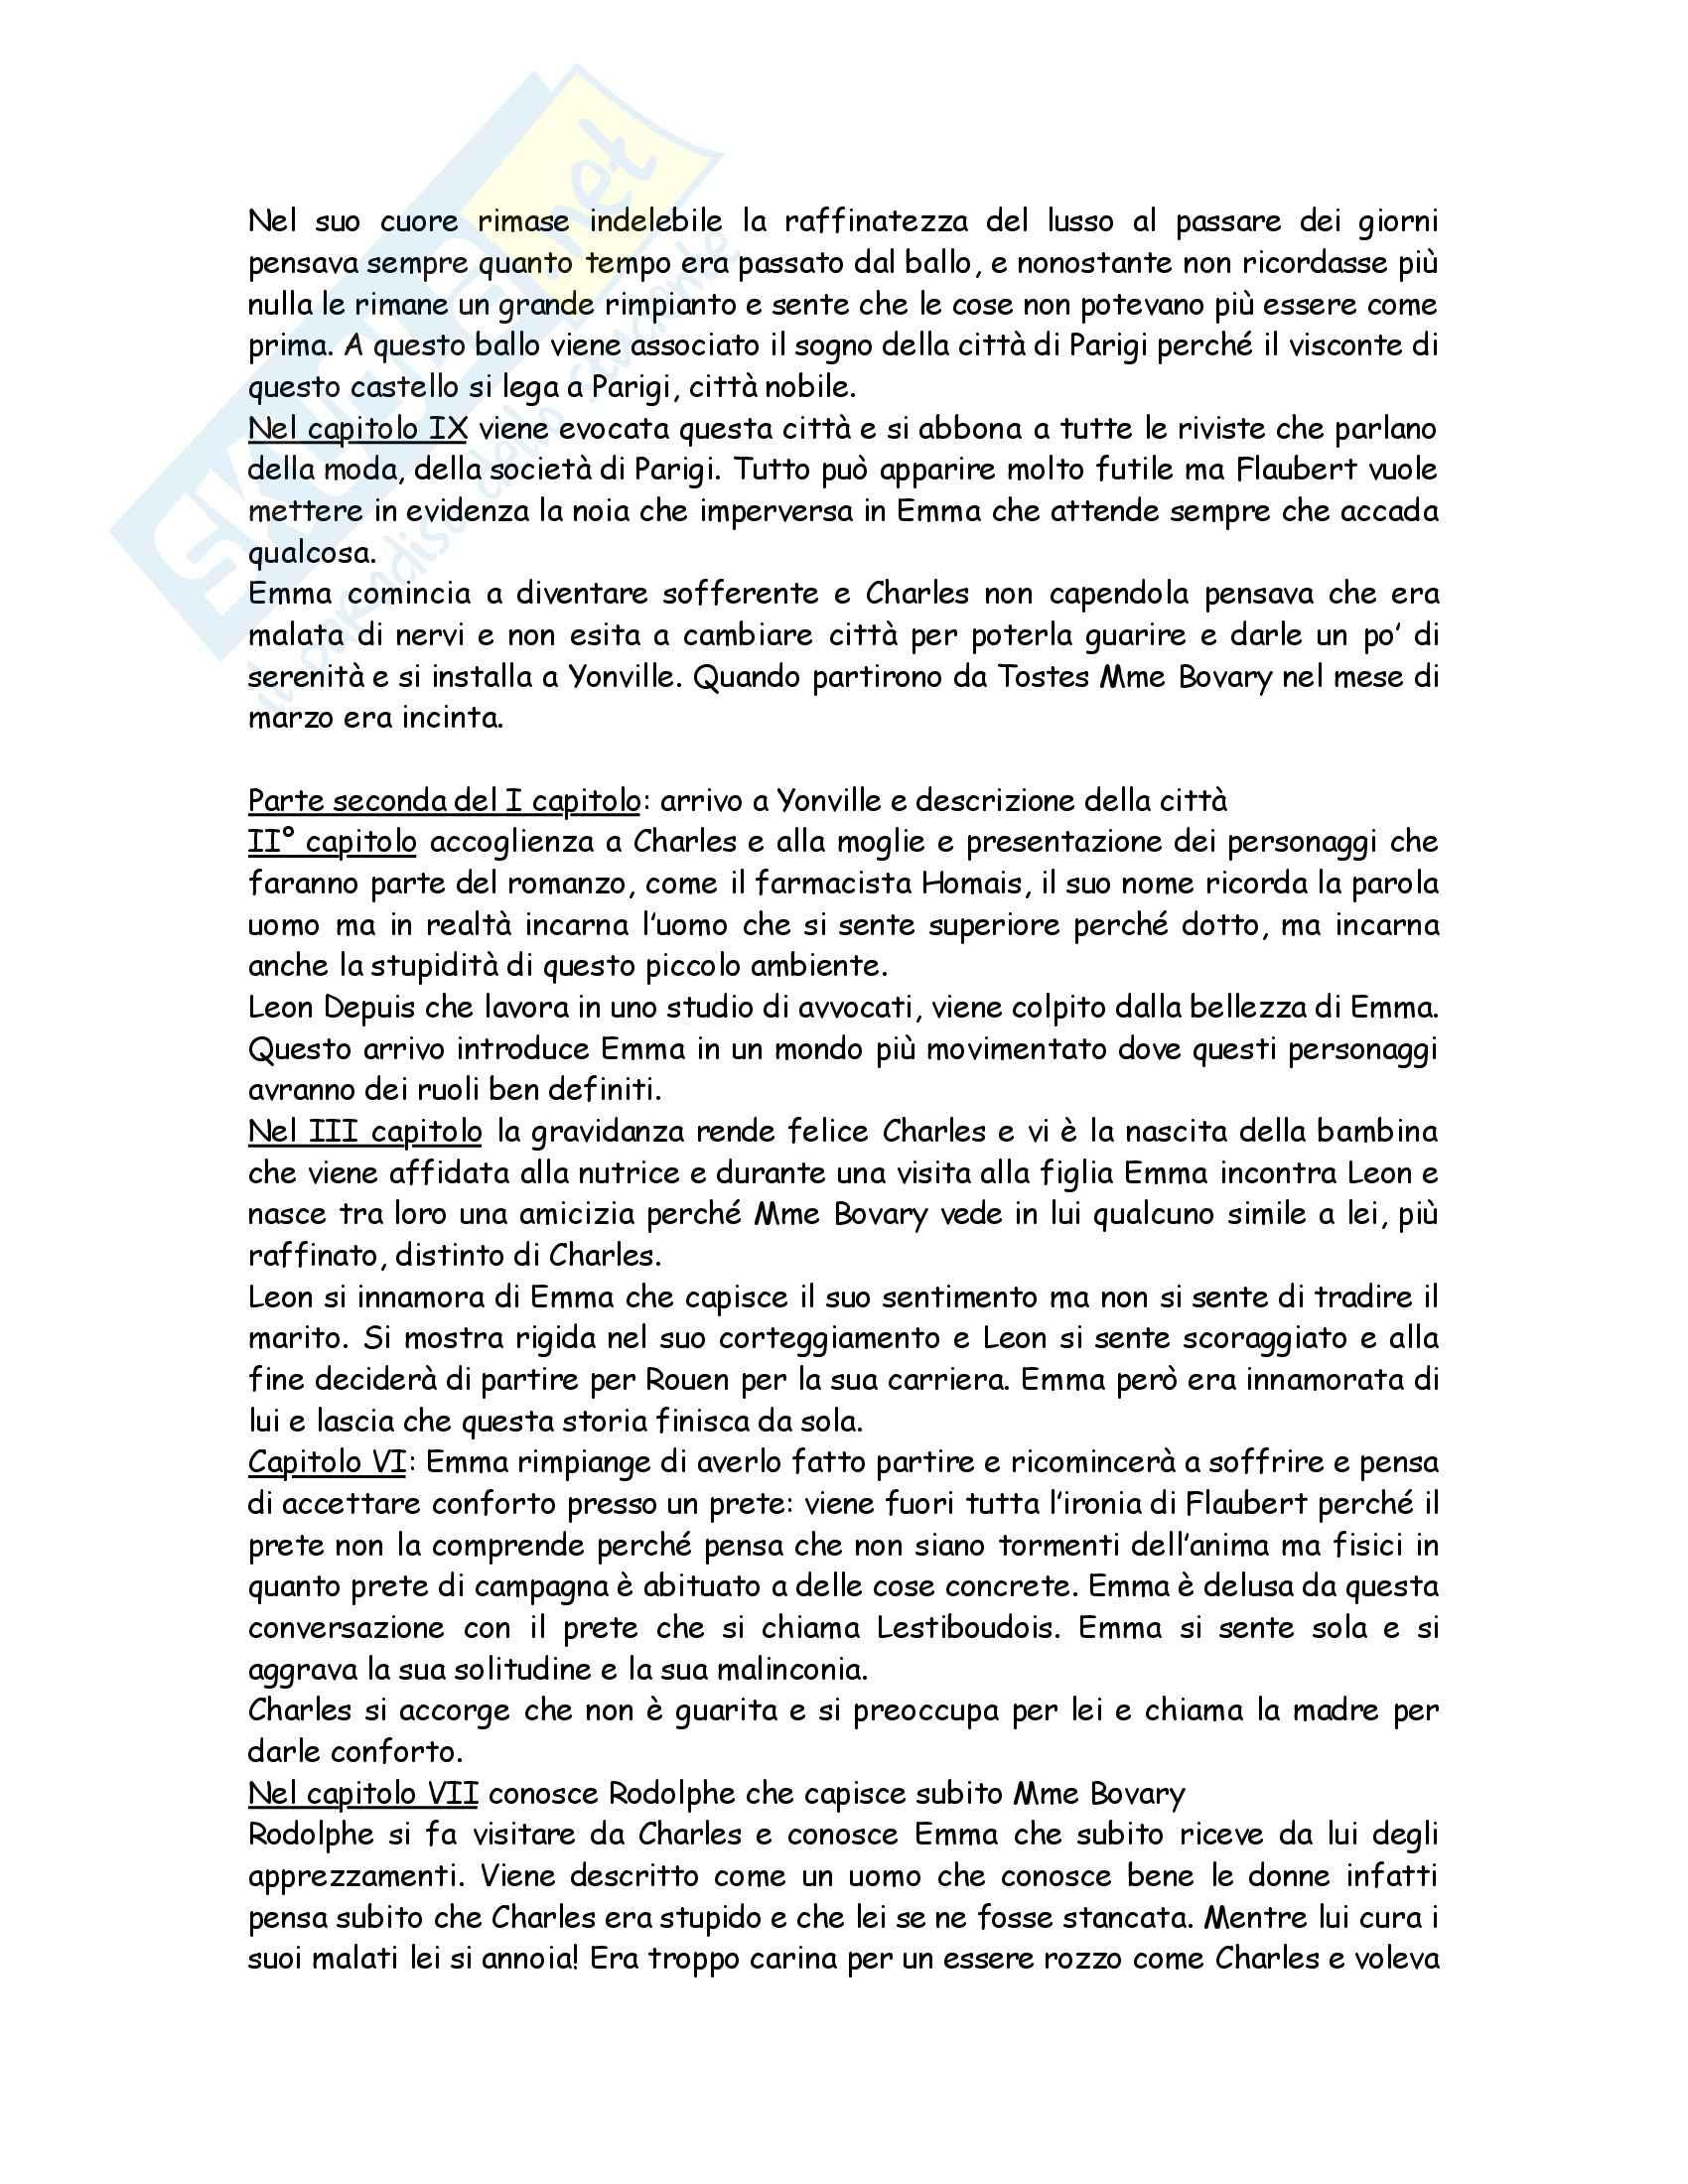 Letteratura francese - Madame Bovary, Ottocento e Novecento Pag. 46